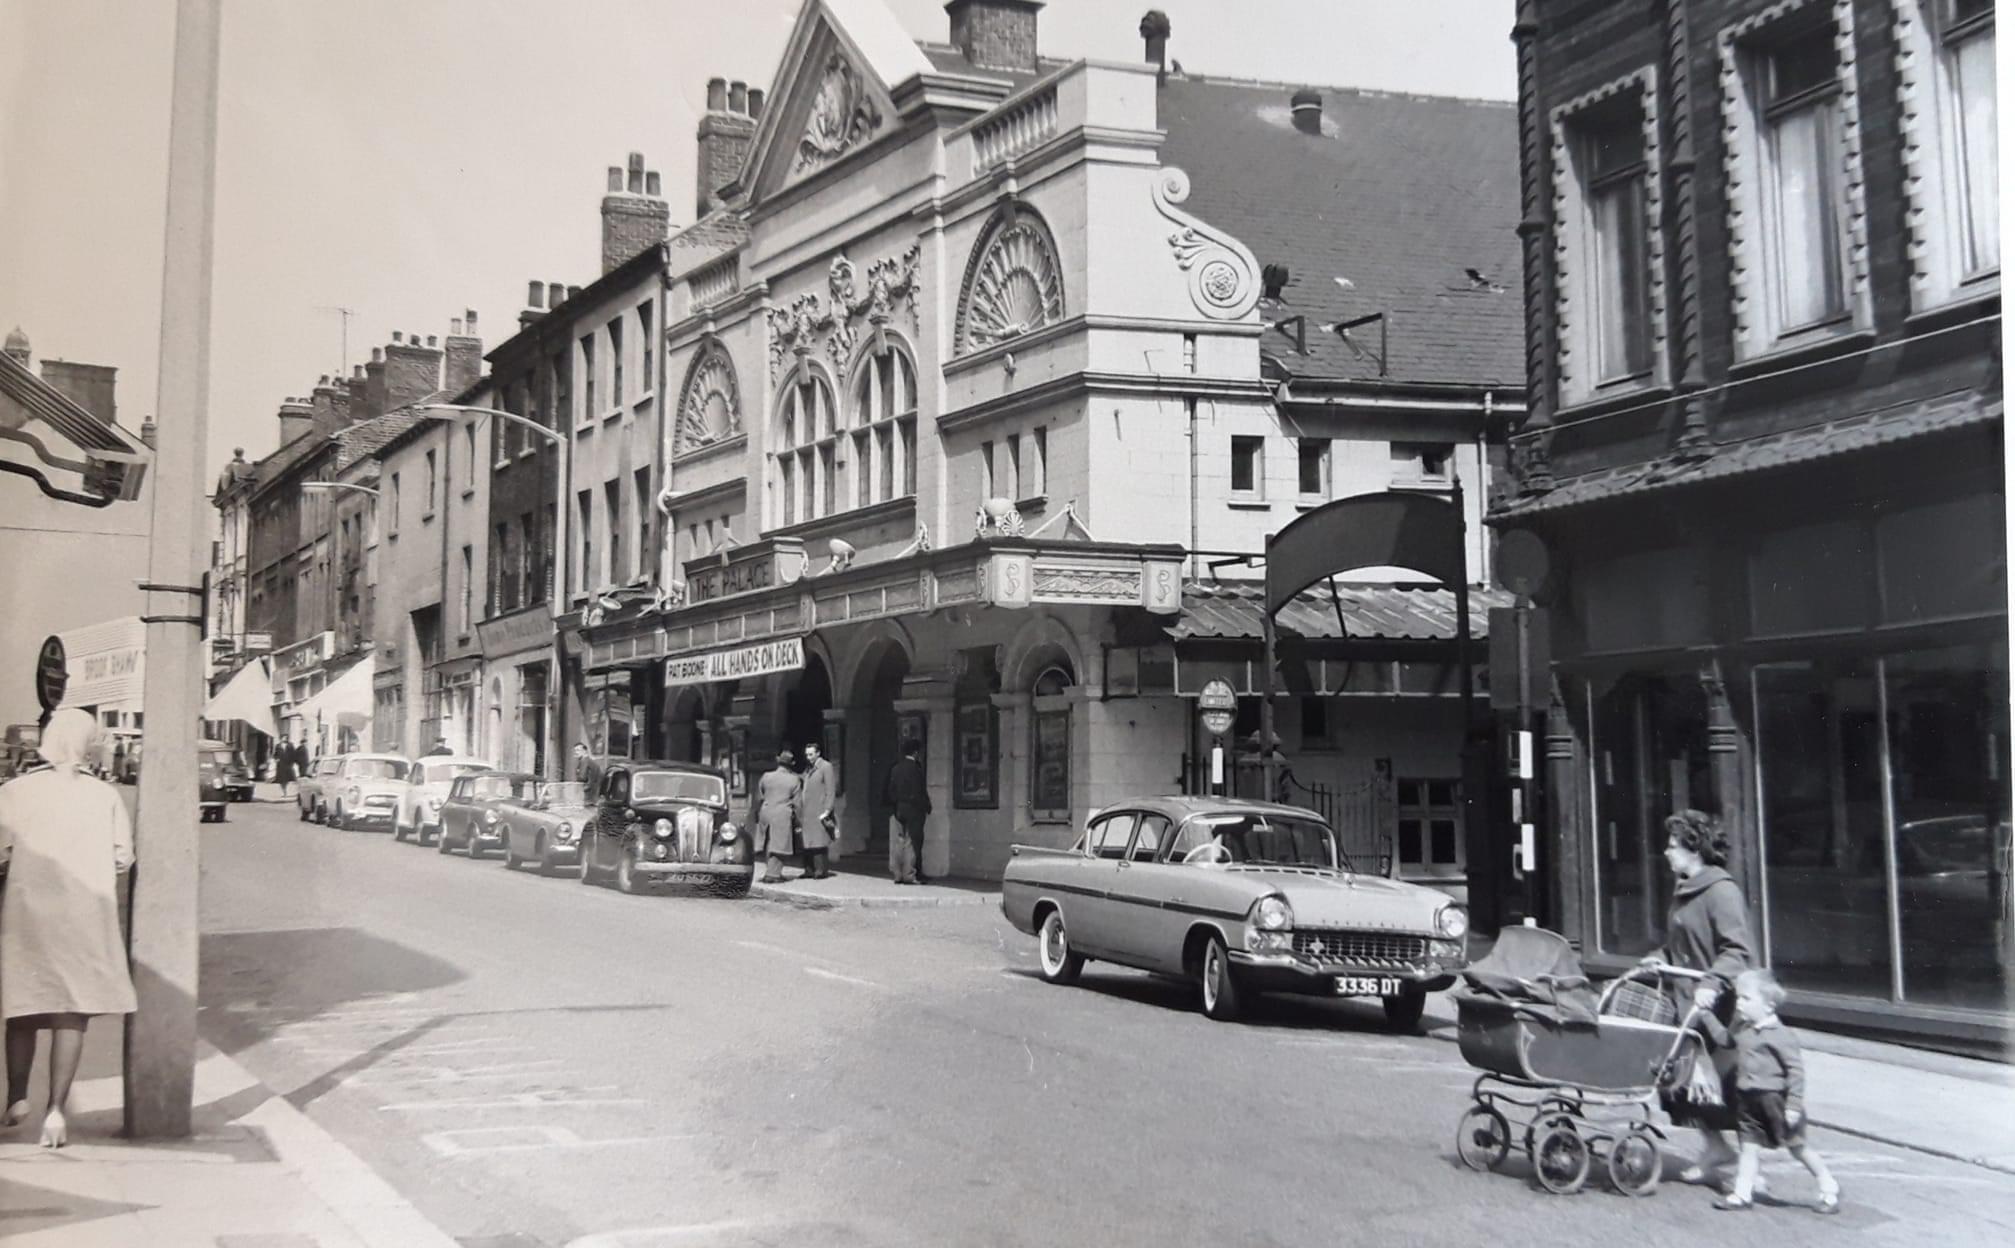 The Palace Union Street